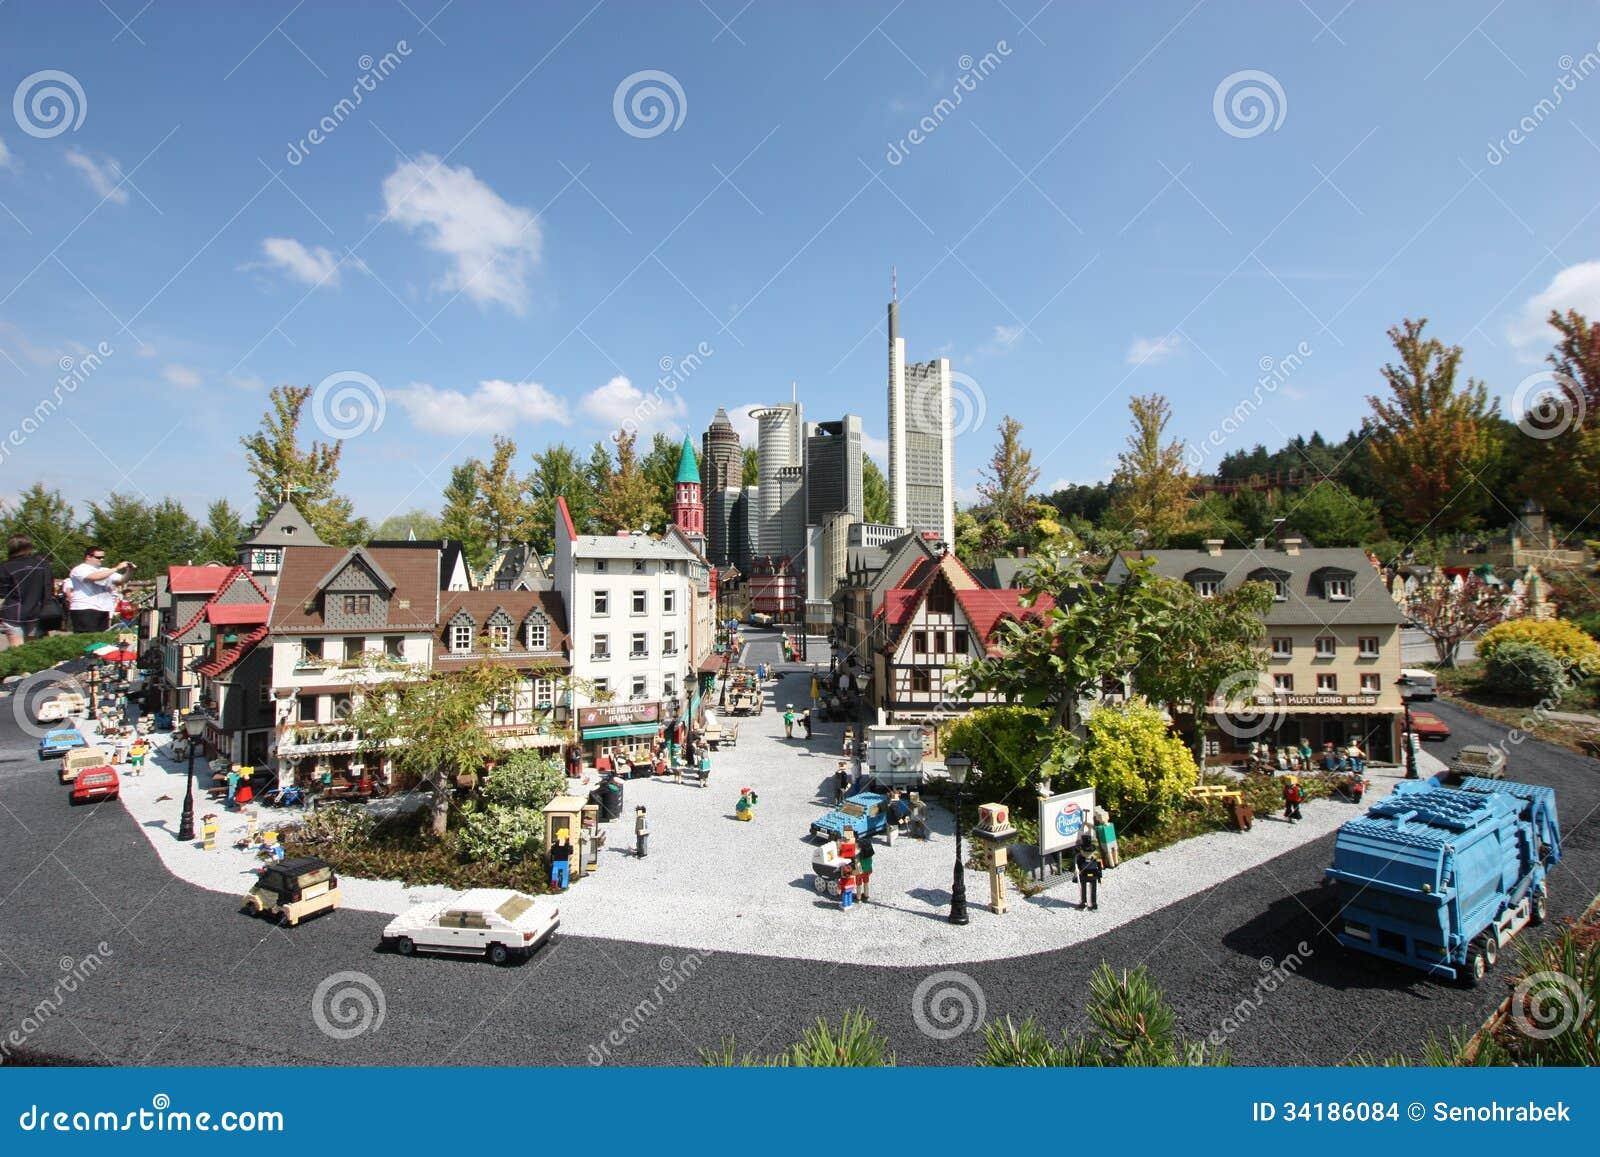 Gunzburg Germany  city photos gallery : GUNZBURG, GERMANY AUGUST 22: Miniland at Legoland Deutschland Resort ...